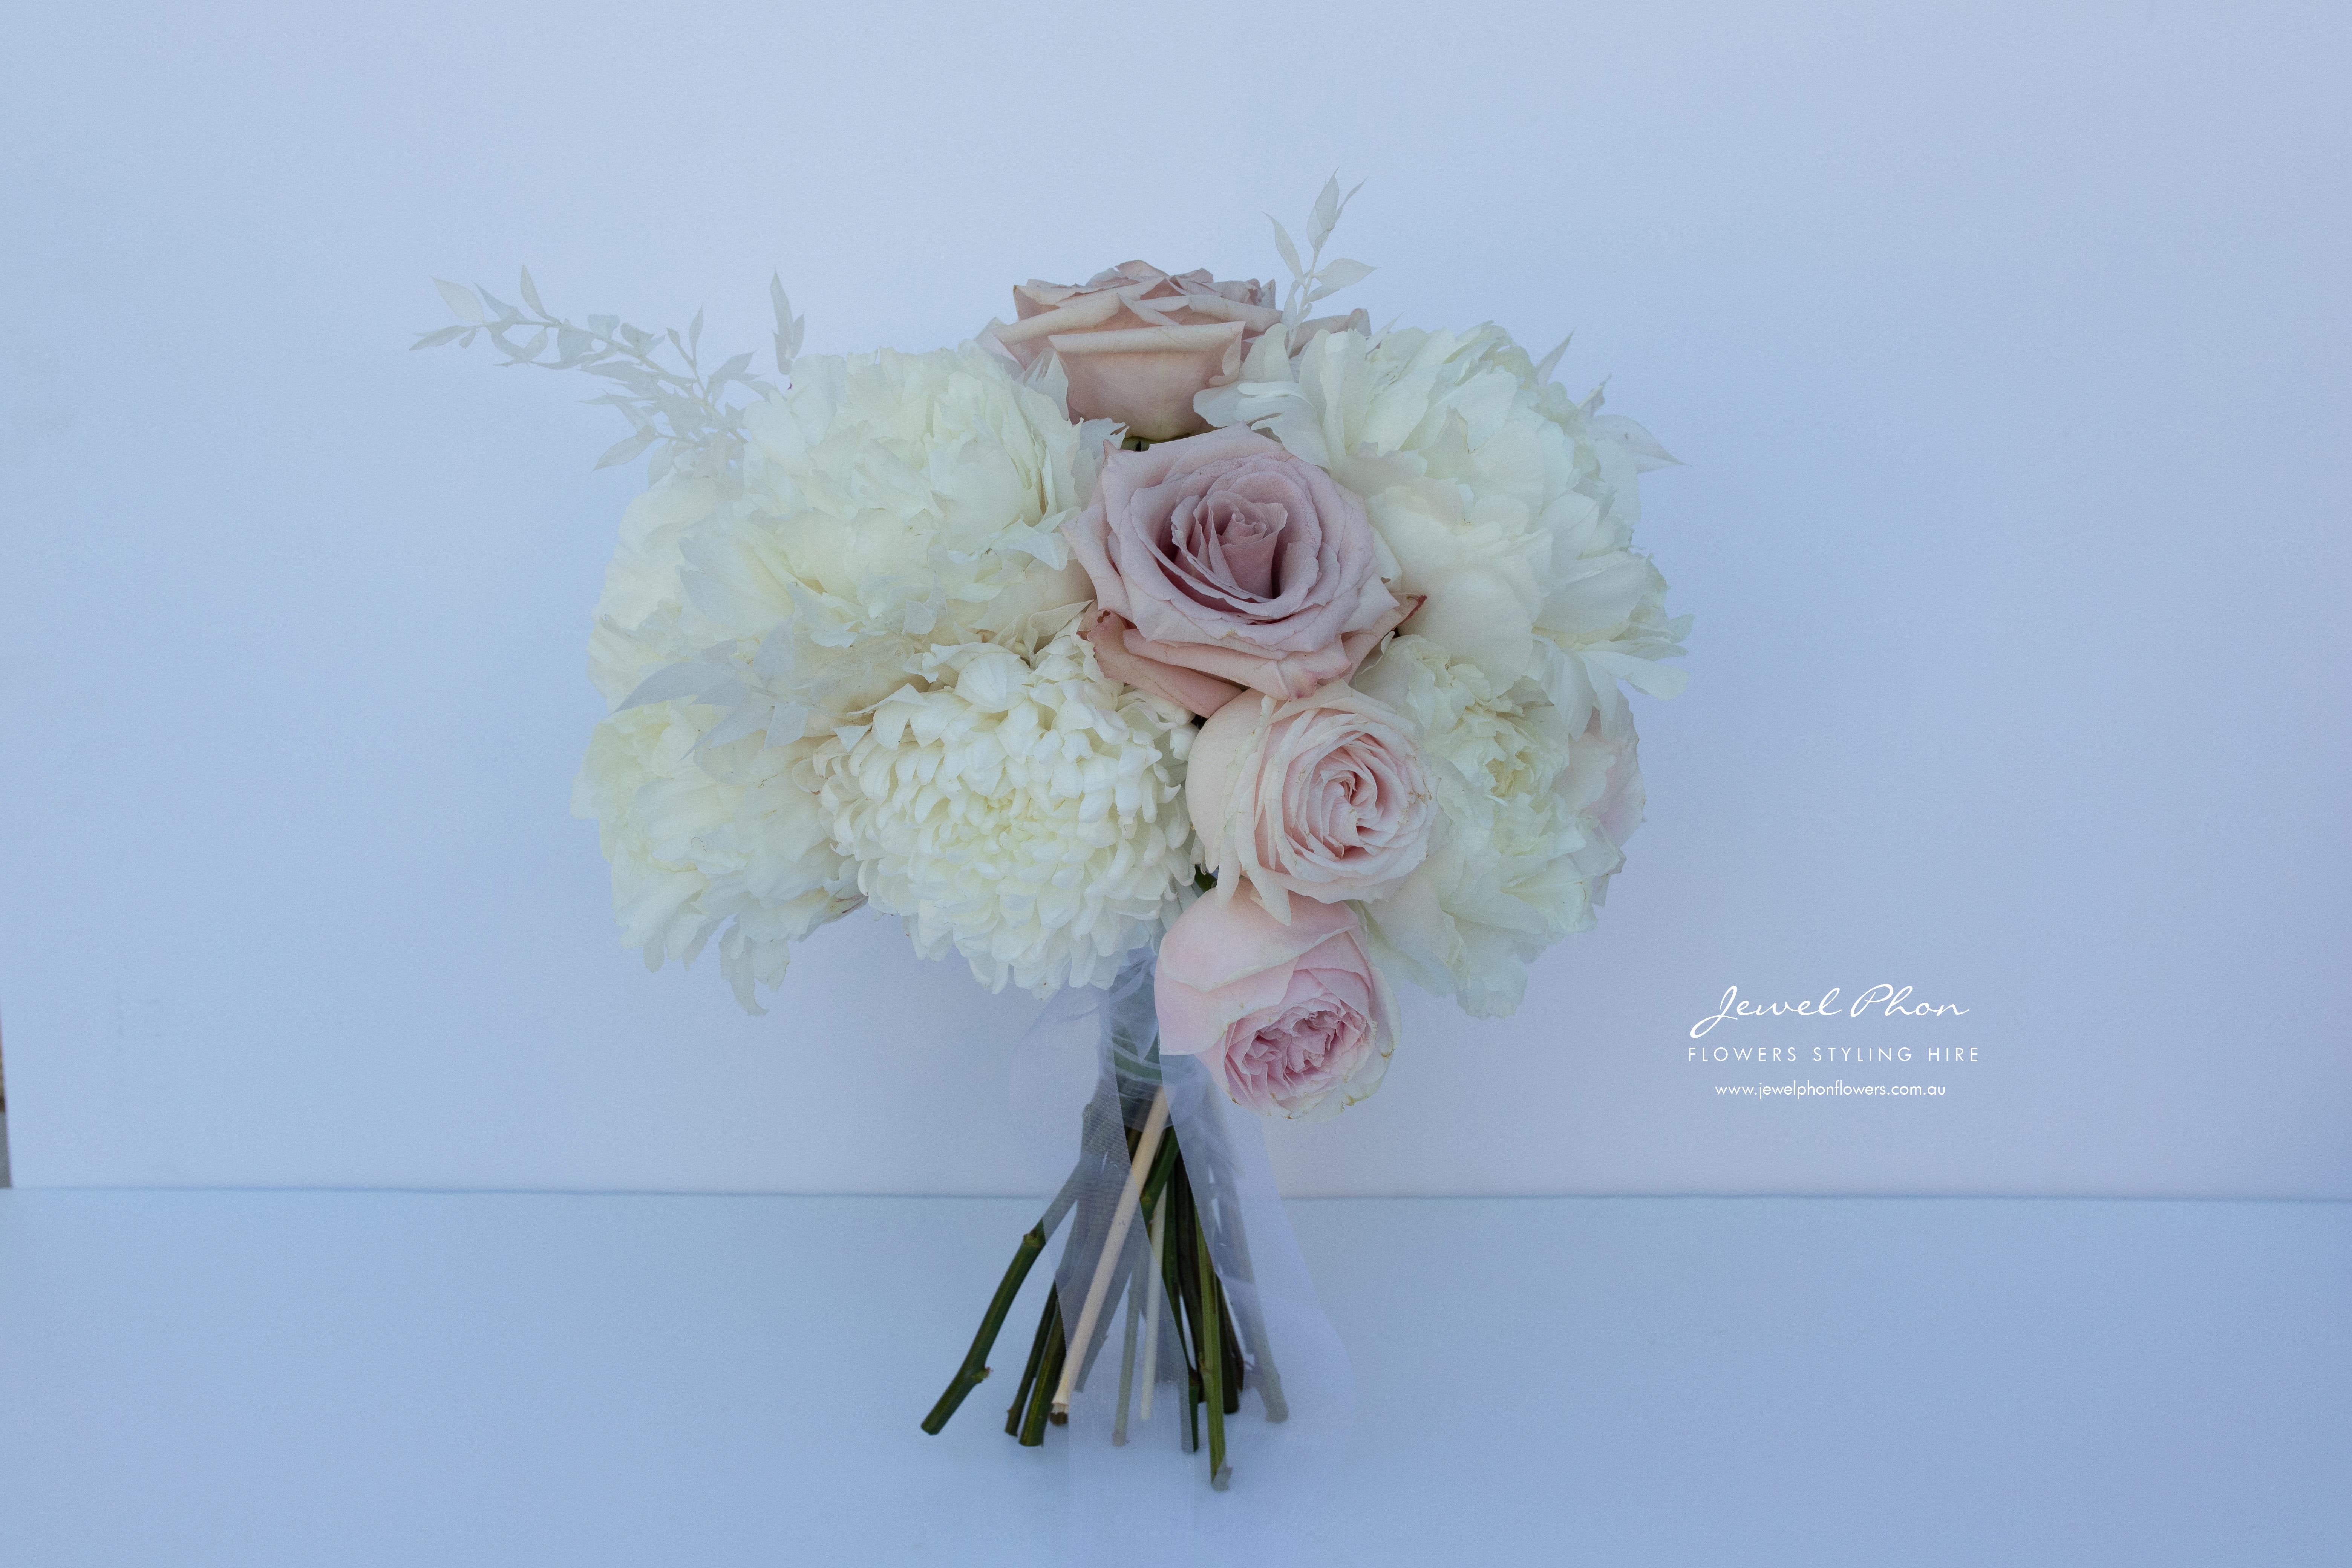 Vanessa's Bouquet